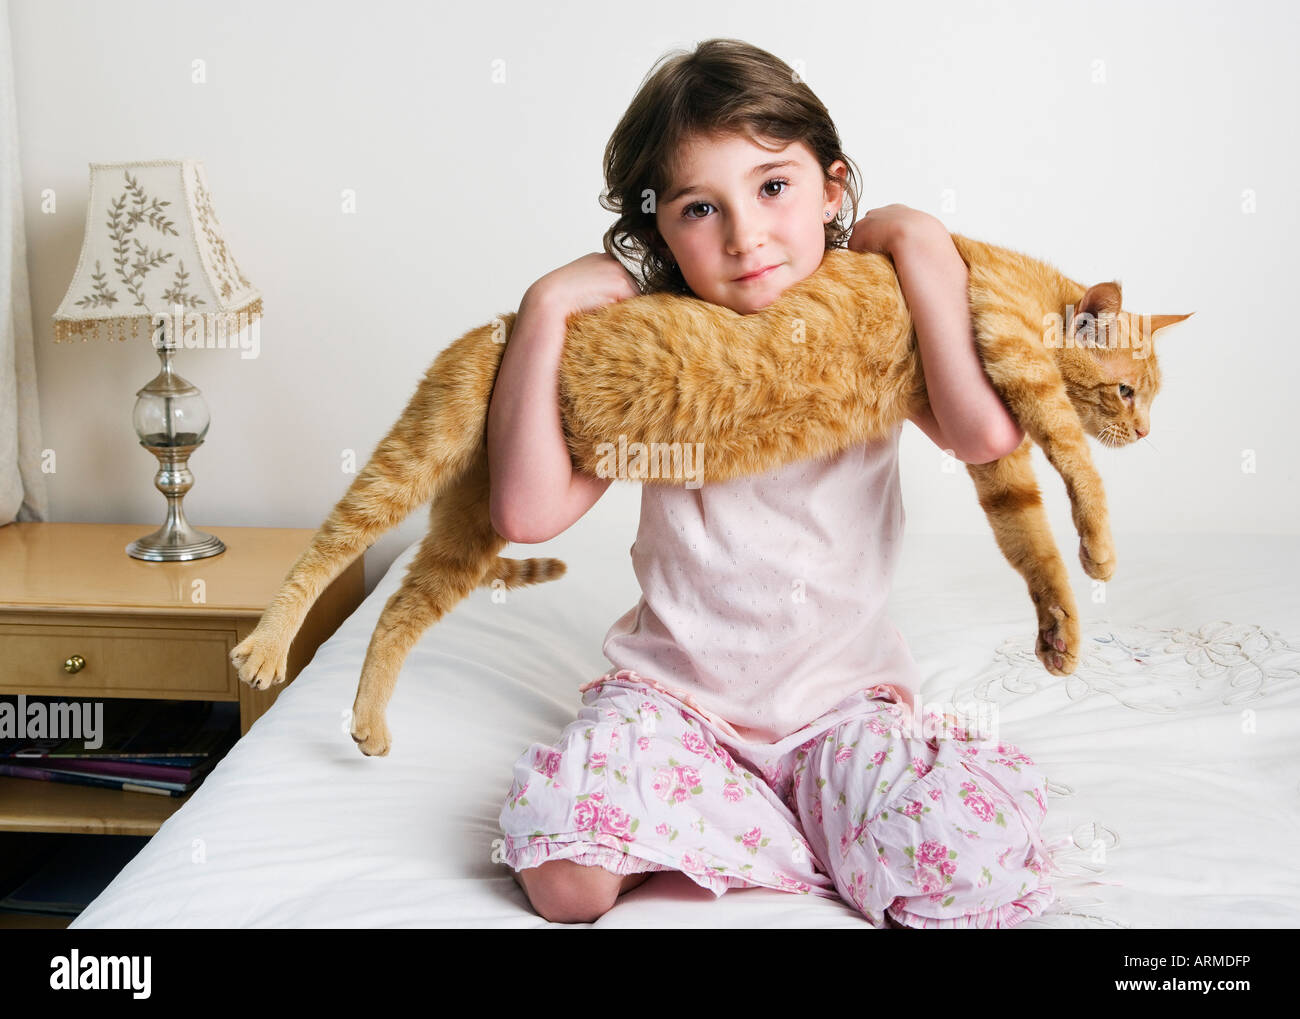 Mädchen halten Katze in armen Stockbild